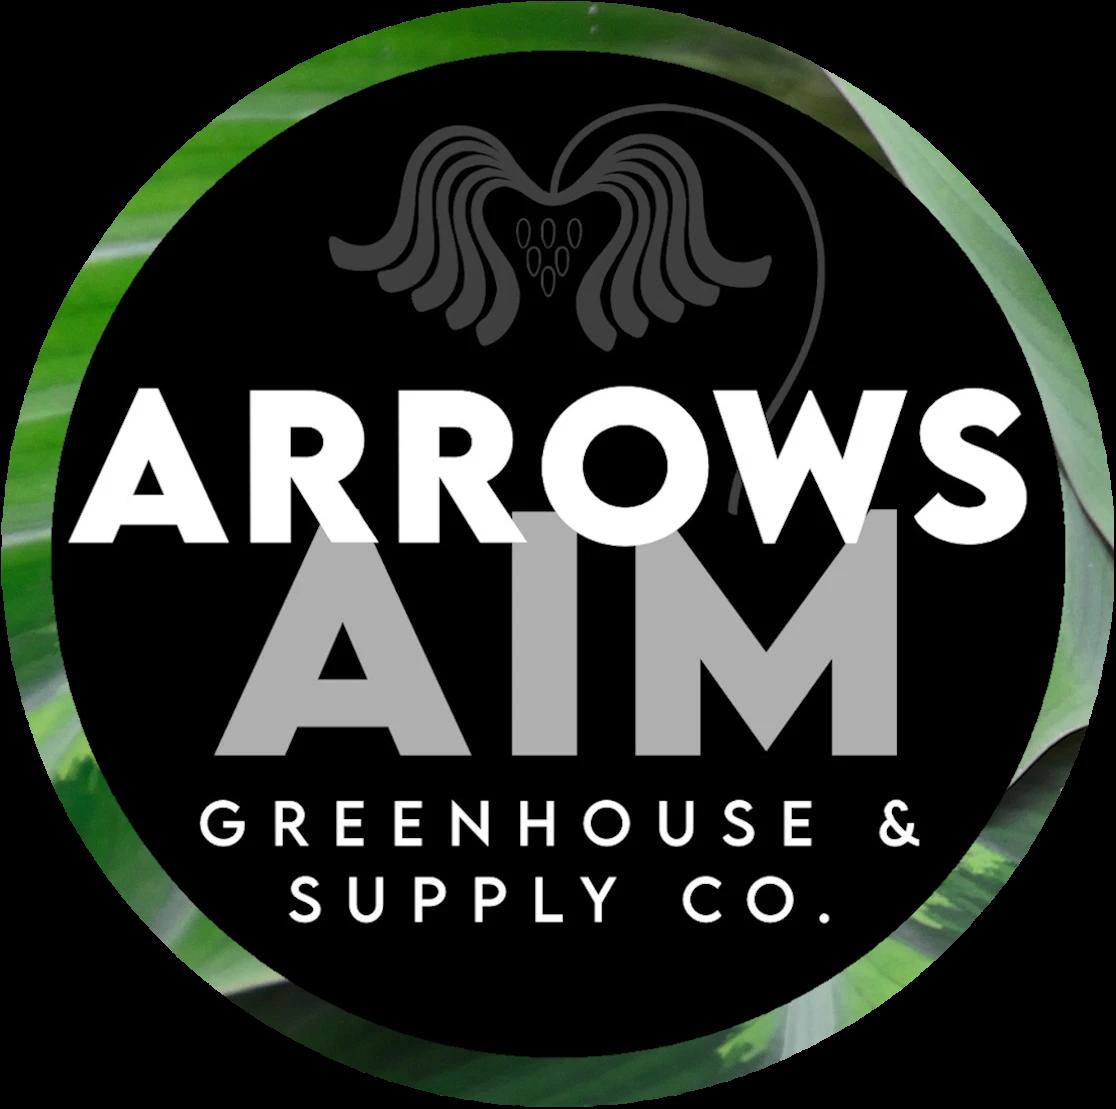 Arrows Aim Greenhouse & Supply Co. logo